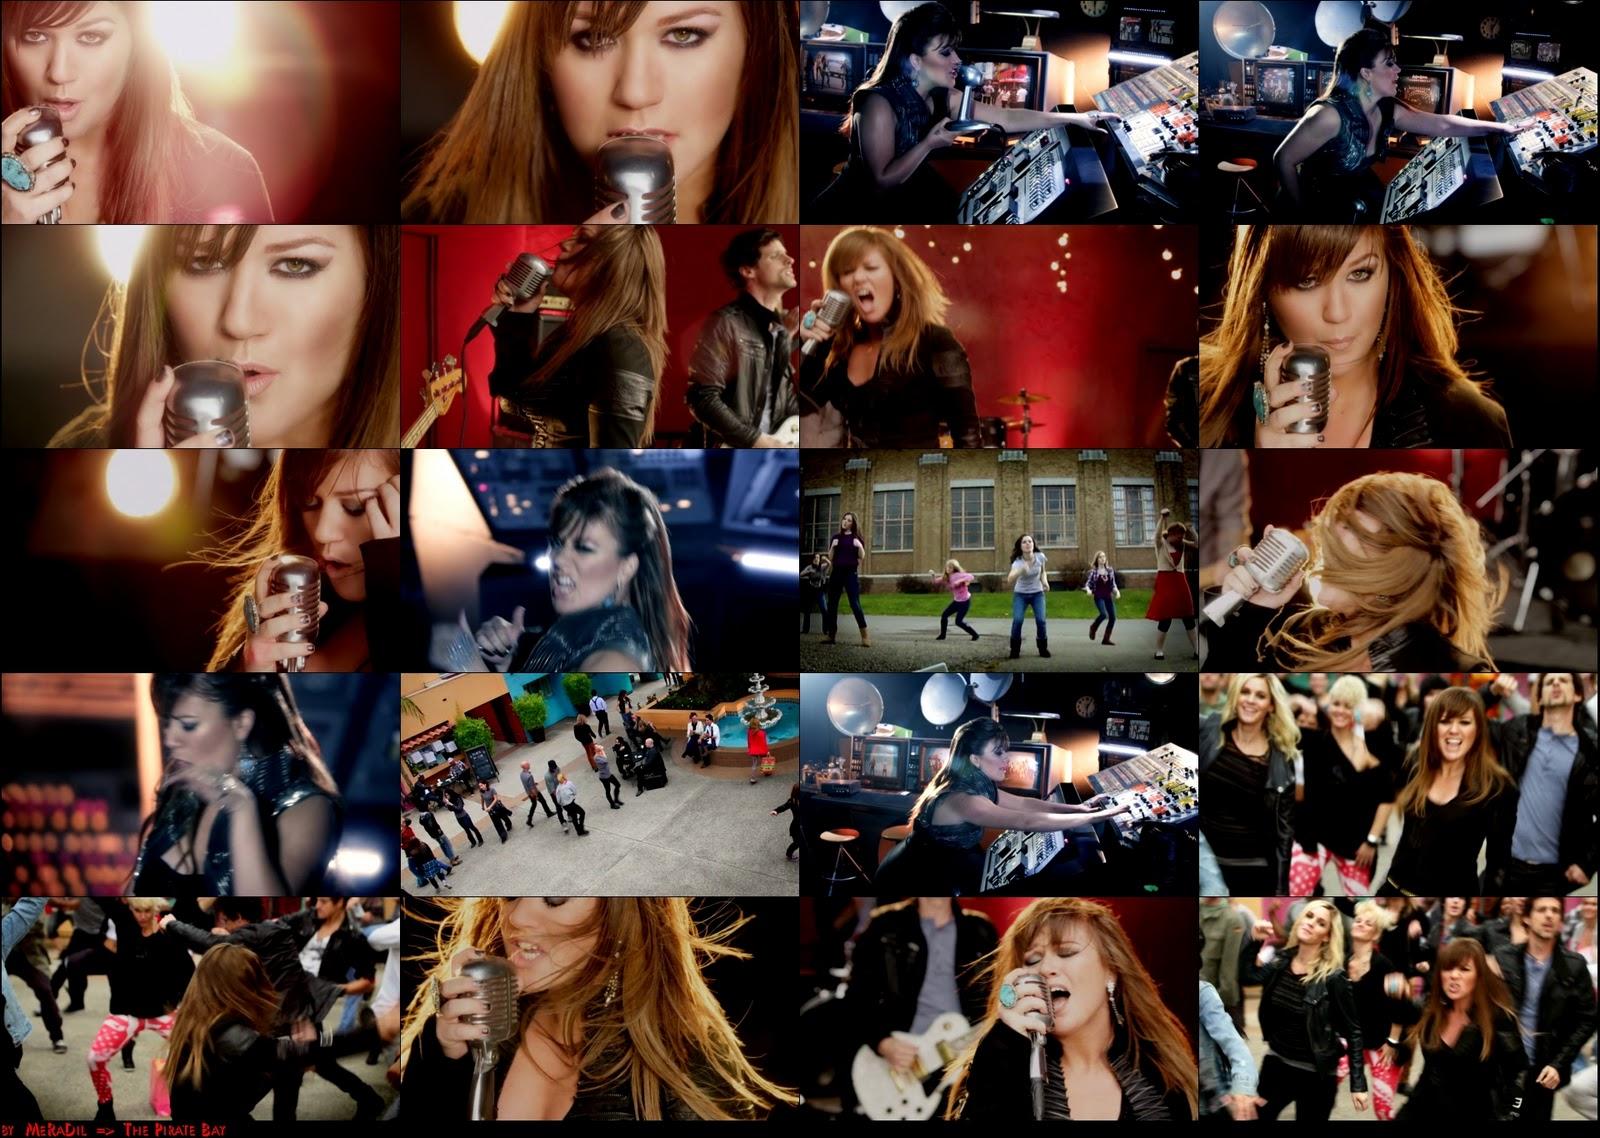 http://2.bp.blogspot.com/-o0pFrIZzMkc/TuzI_ibJzTI/AAAAAAAAAYA/kyK3-lEEC6w/s1600/Kelly+Clarkson+-+Stronger+%2528What+Doesn%2527t+Kill+You%2529+2011+HD+Music+Video.jpg